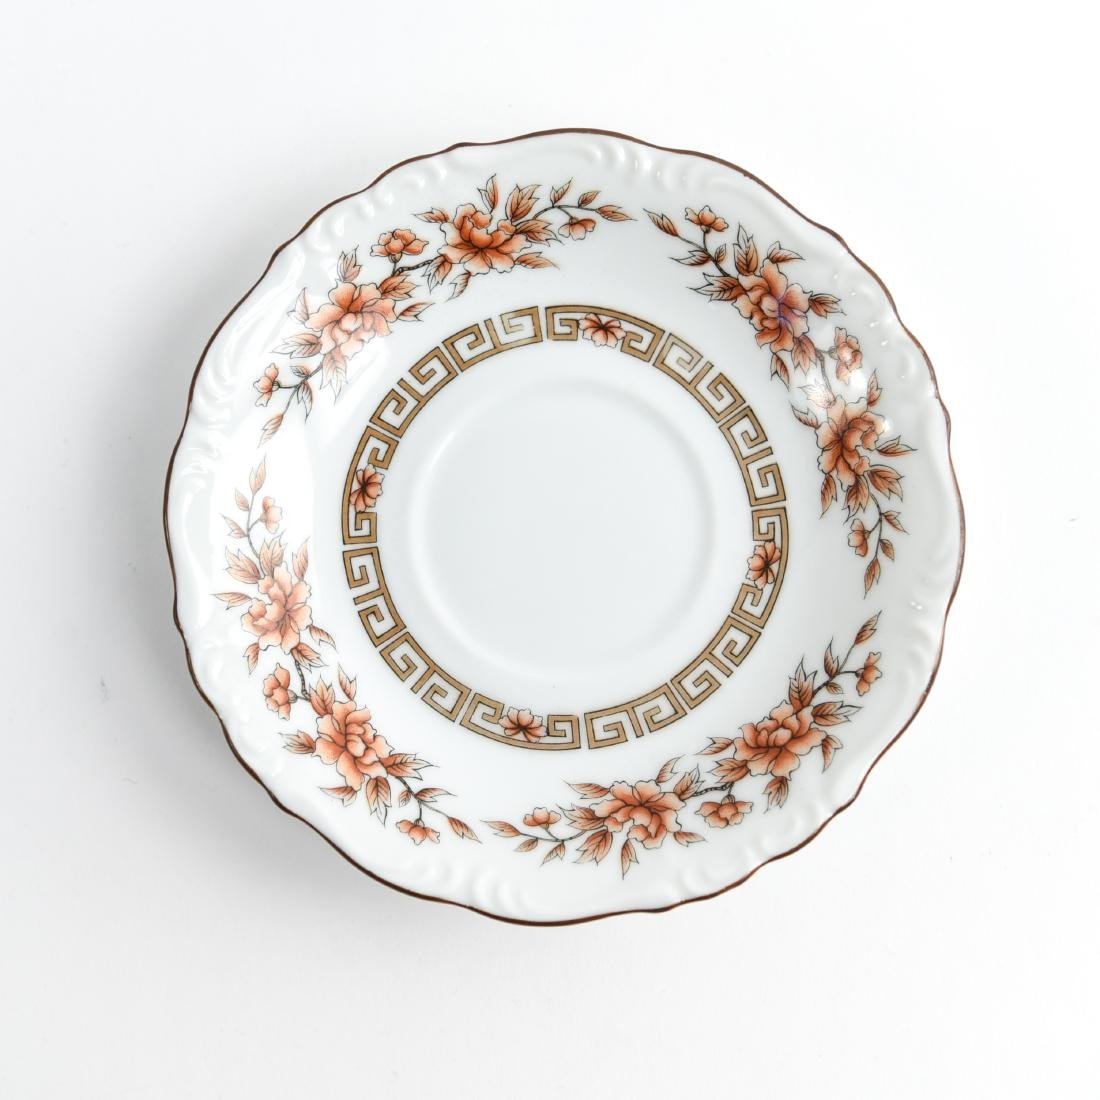 HARA JAPANESE PORCELAIN DINNER SERVICE - 5